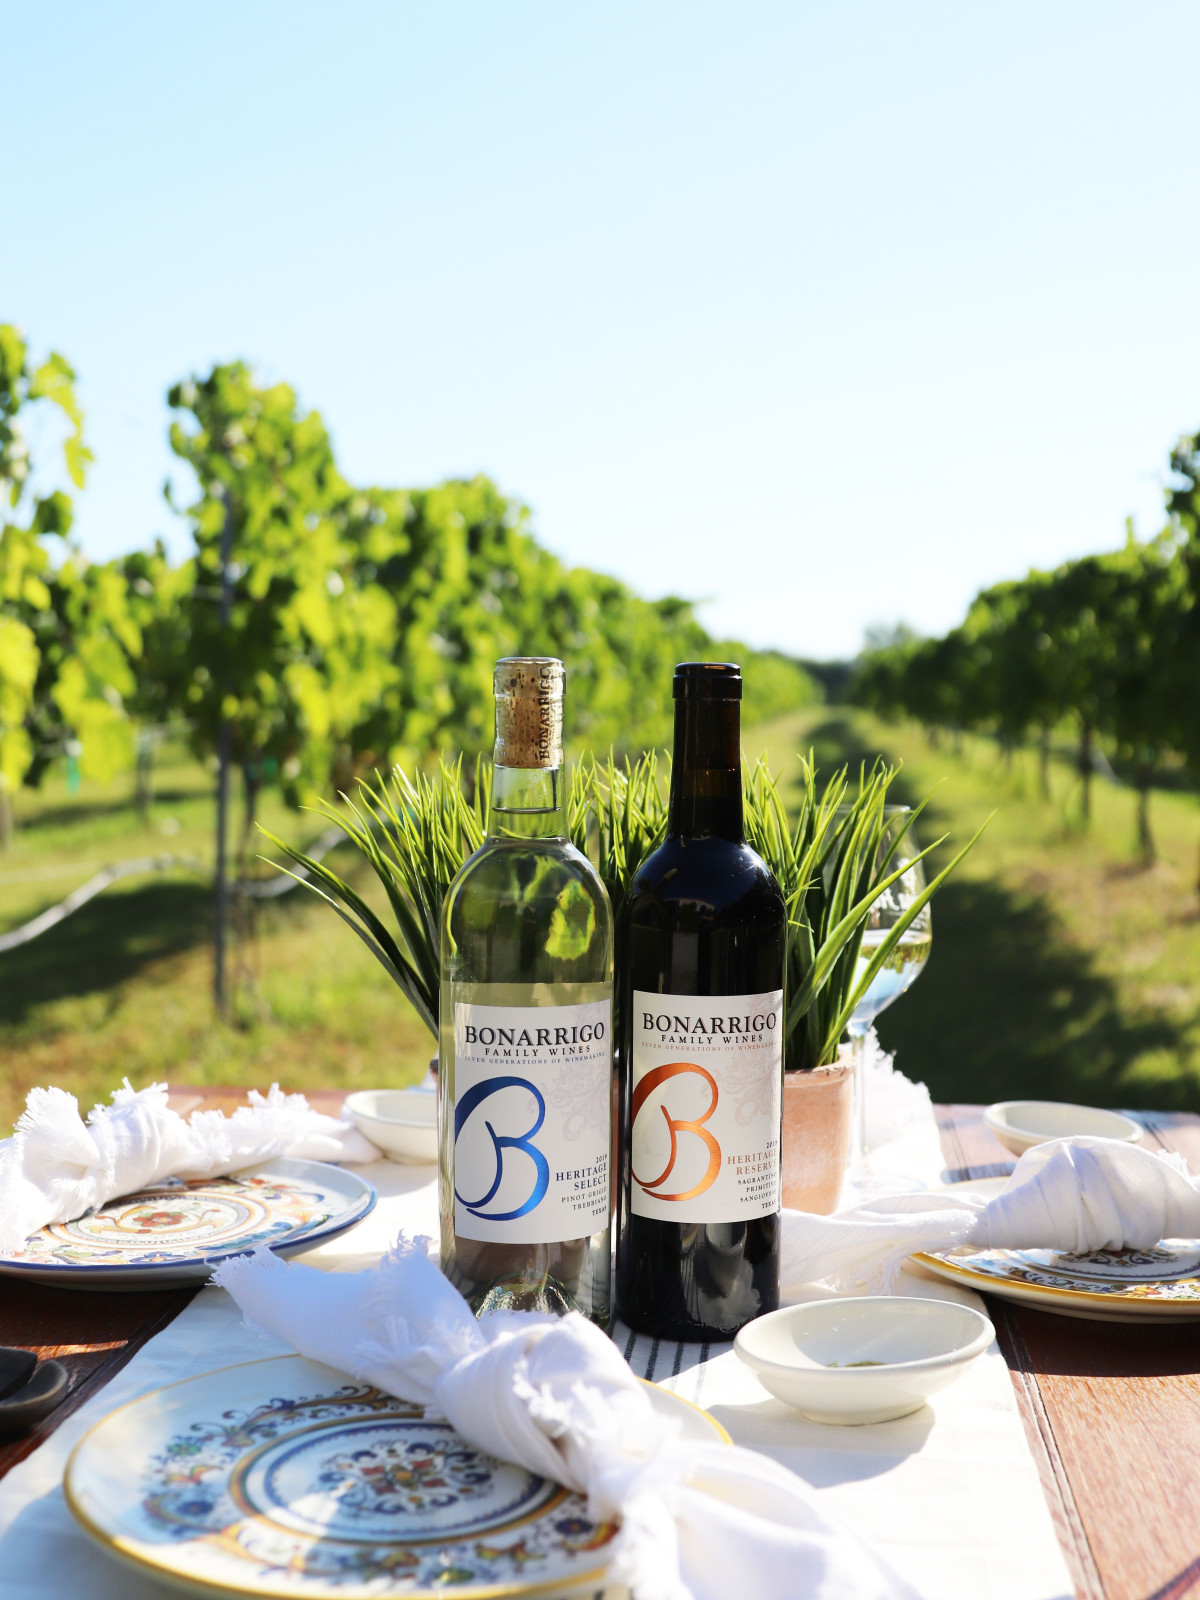 Messina Hof Bonarrigo Family Wines collection